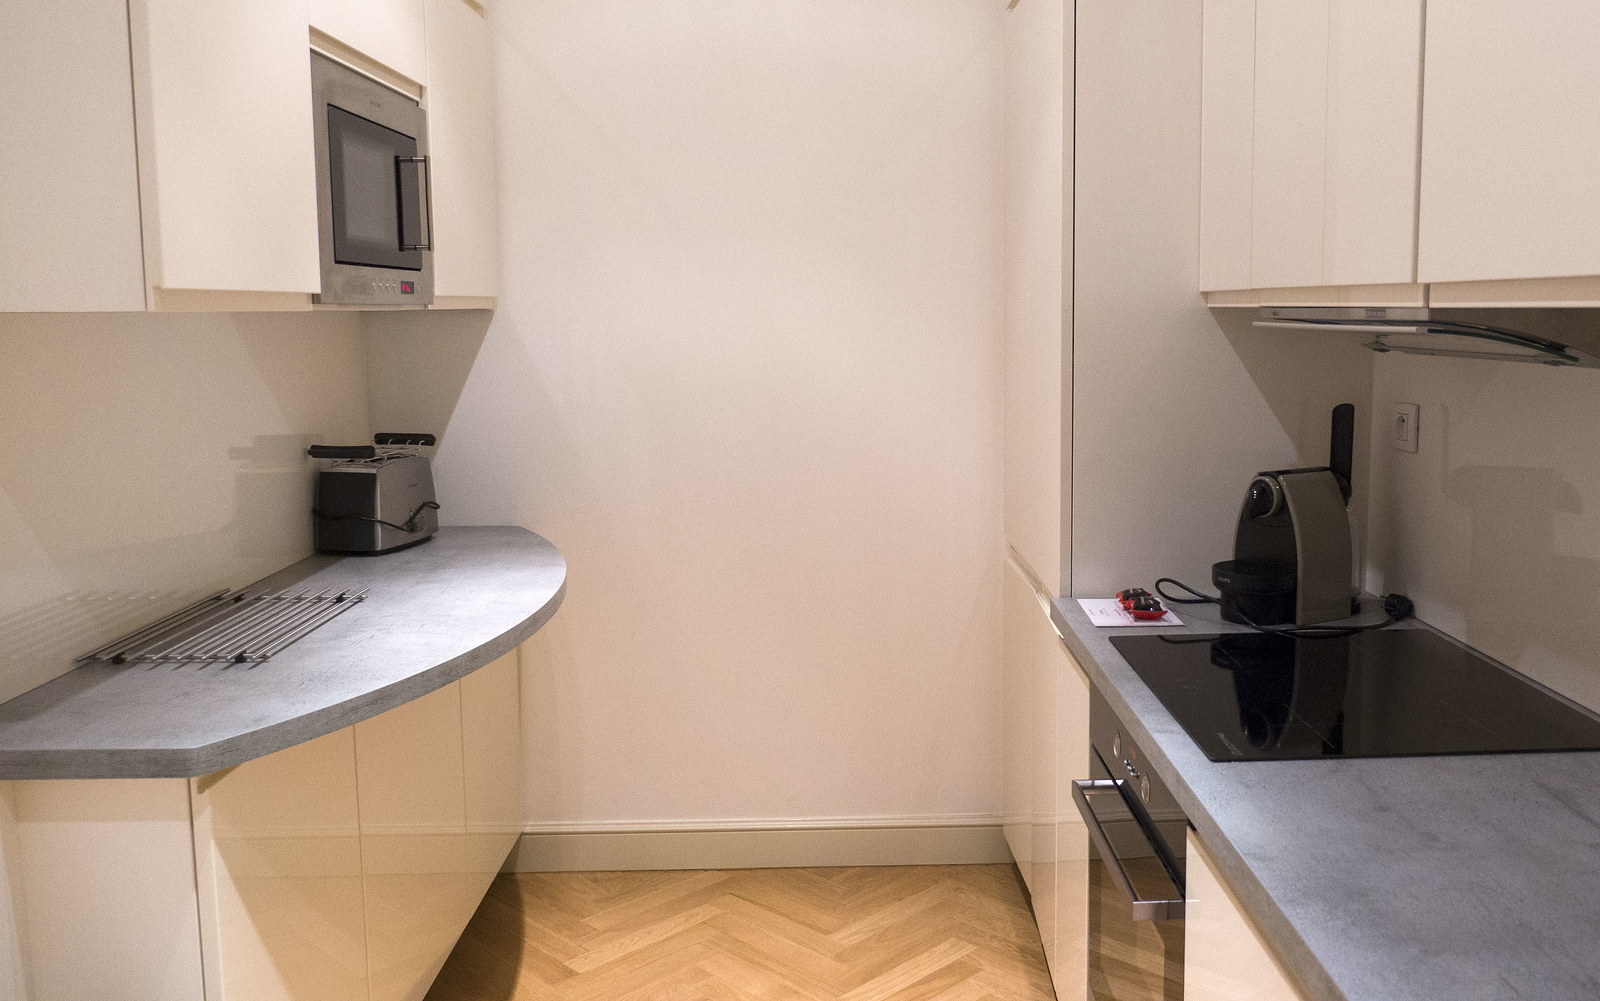 Best Prague Apartment for Travellers: Prague City Apartments